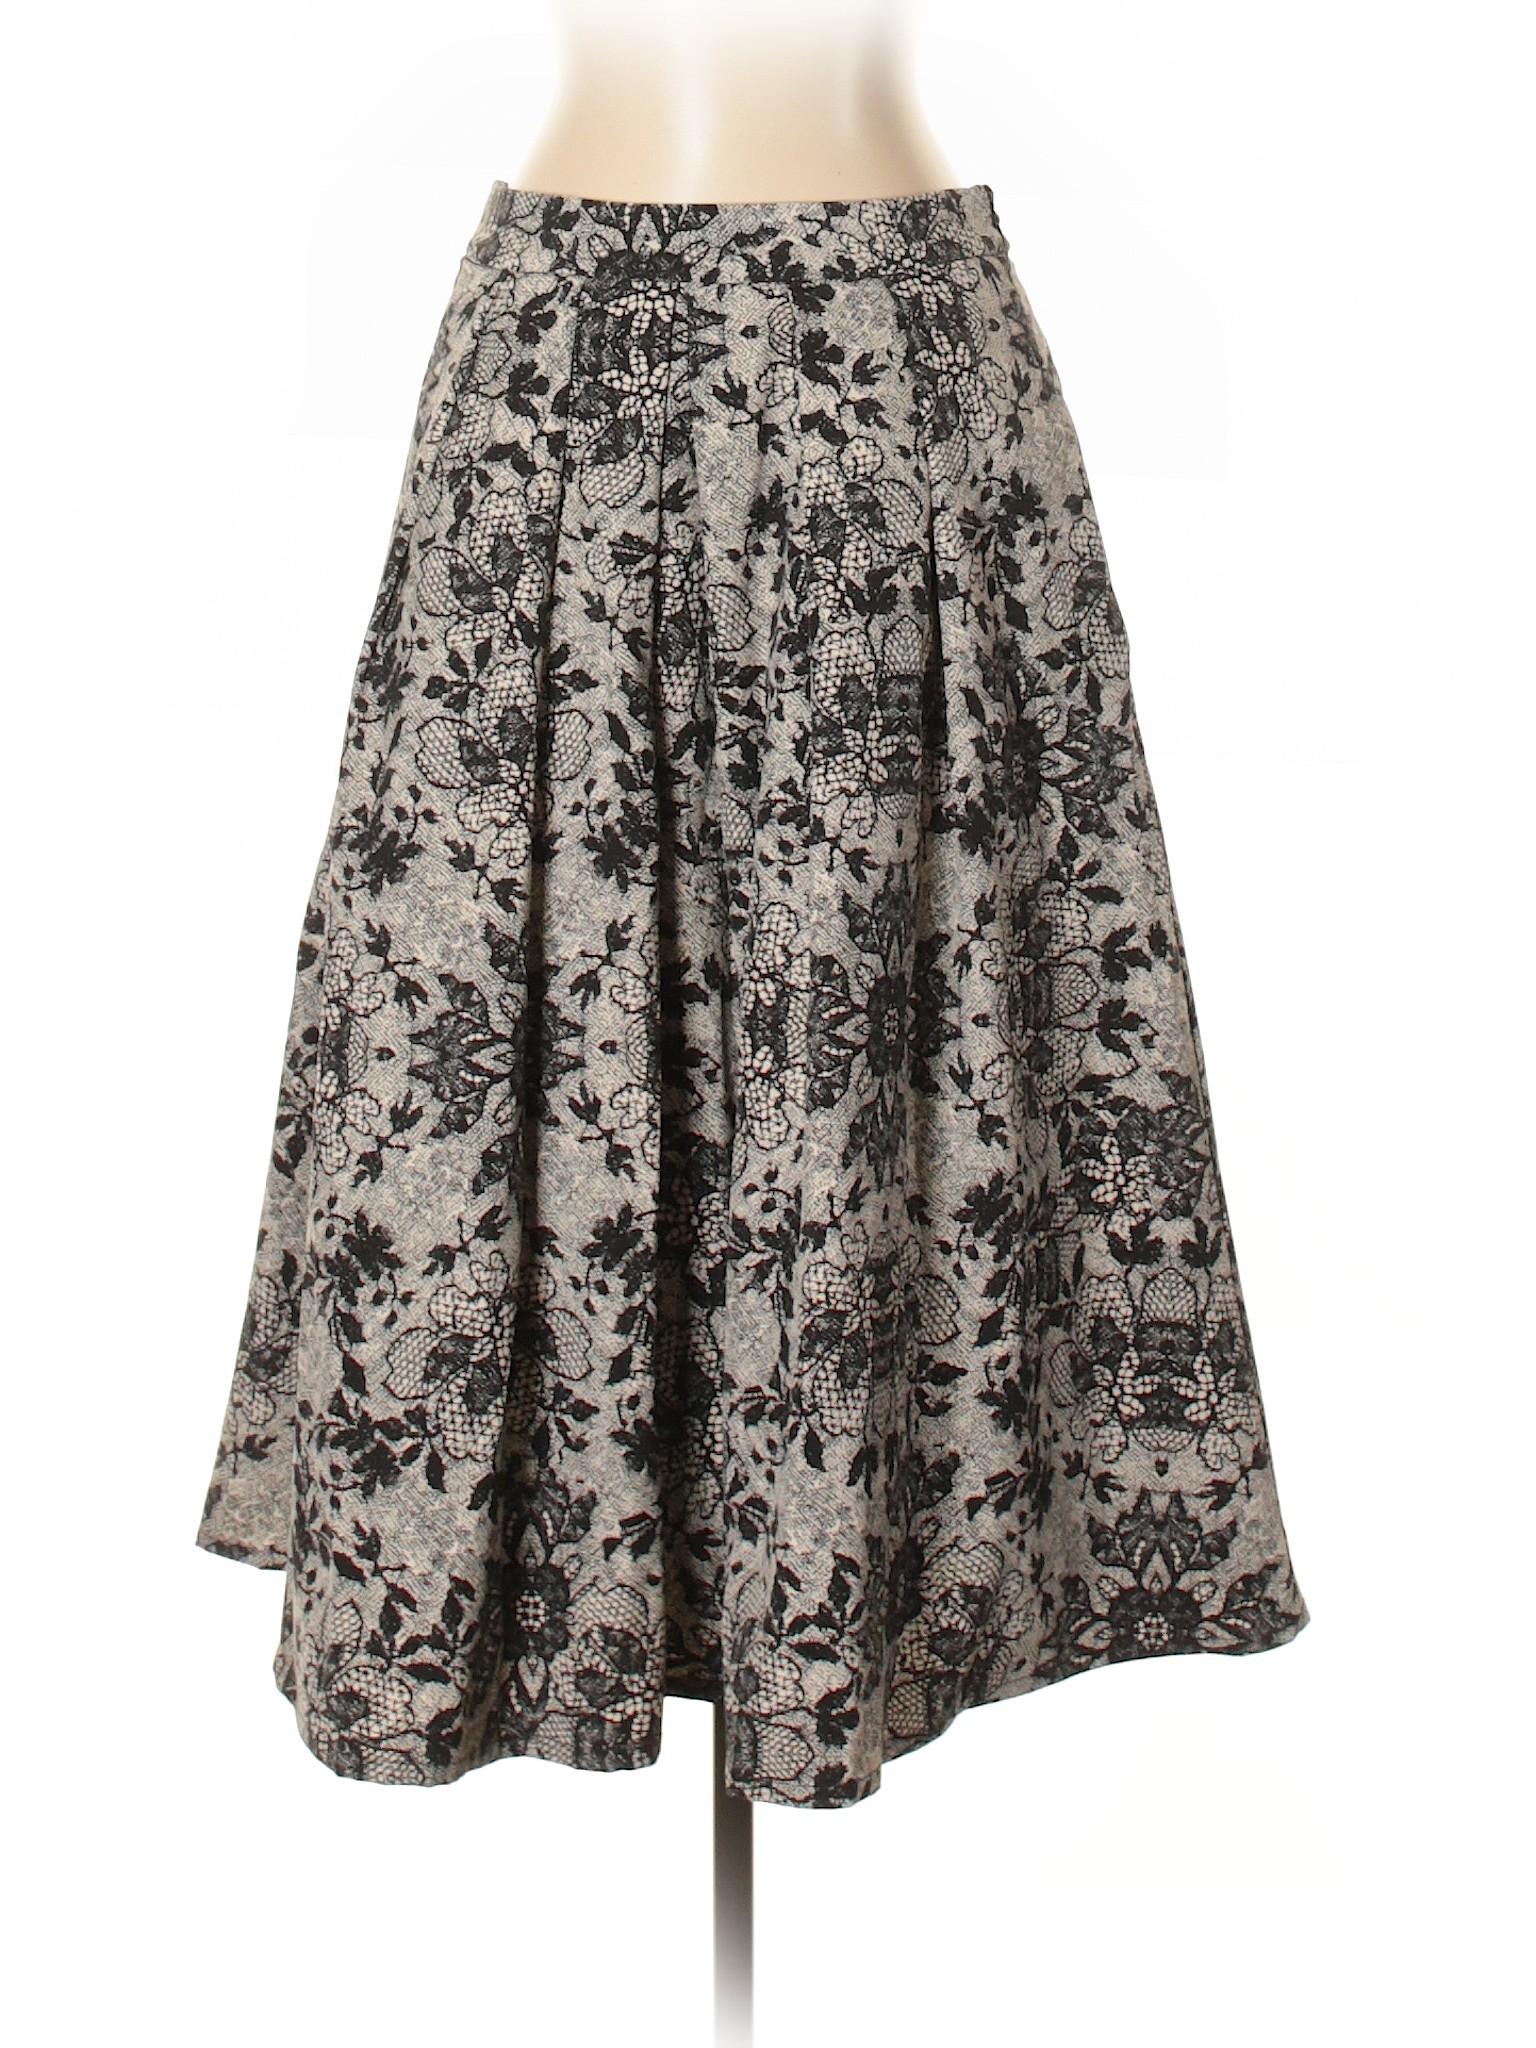 Rancic Giuliana G by leisure Casual Skirt Boutique qwPIU4x